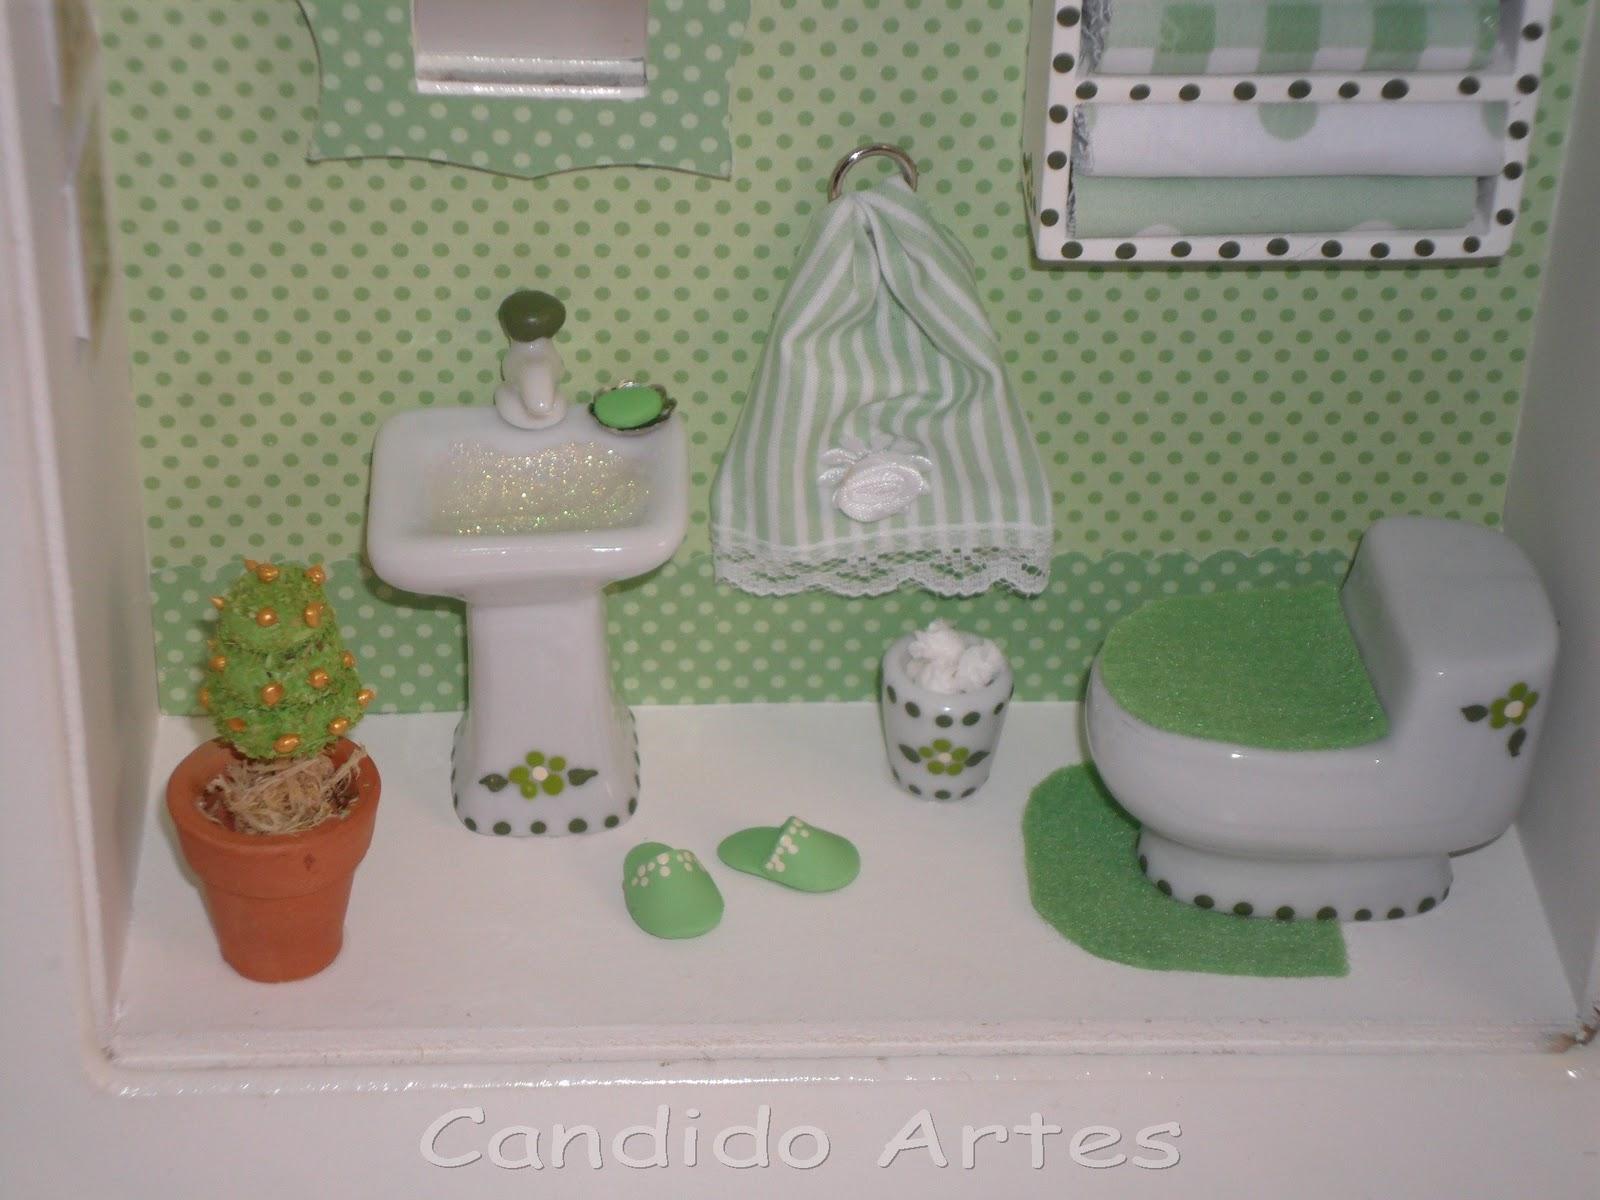 Artesanato Fortaleza Comprar ~ Artesanato Candido Artes Quadro miniatura de banheiro poá verde